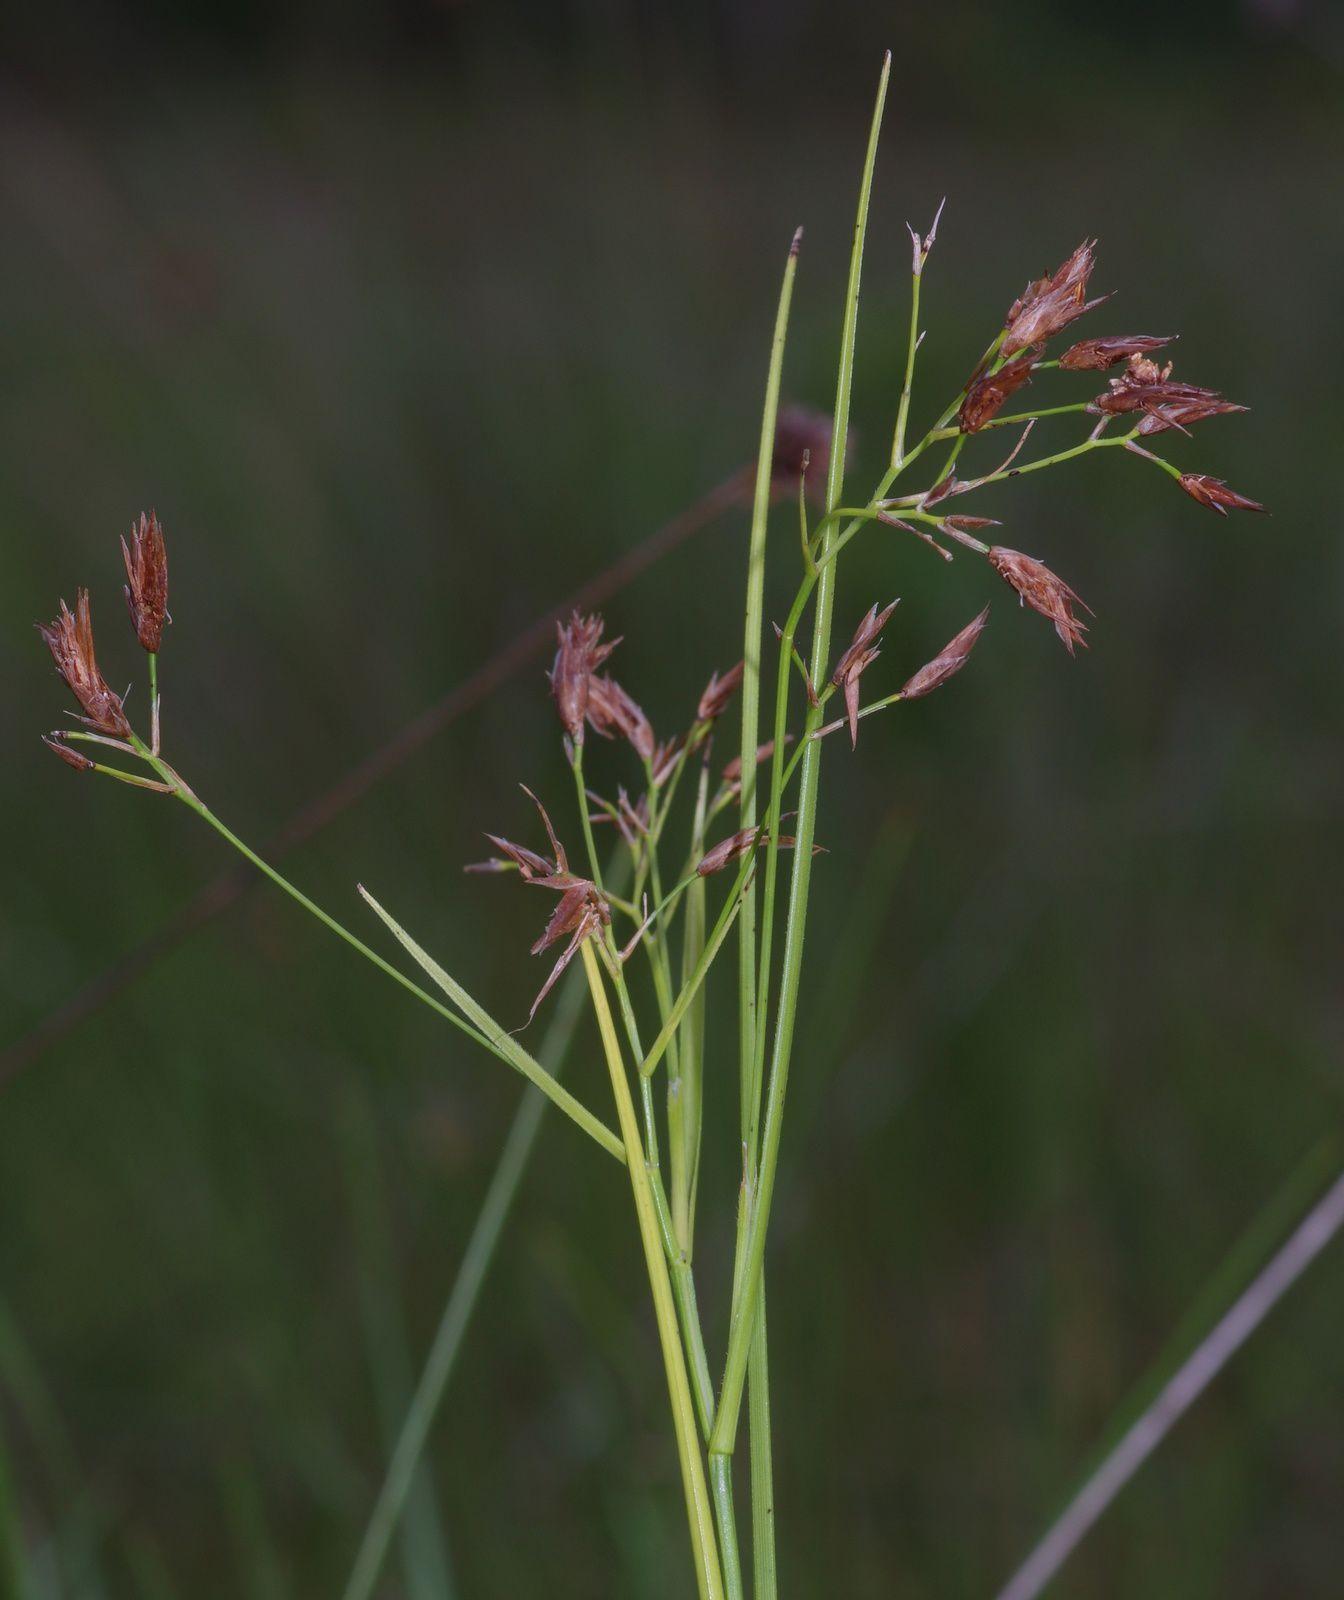 Rhynchospora cajennensis